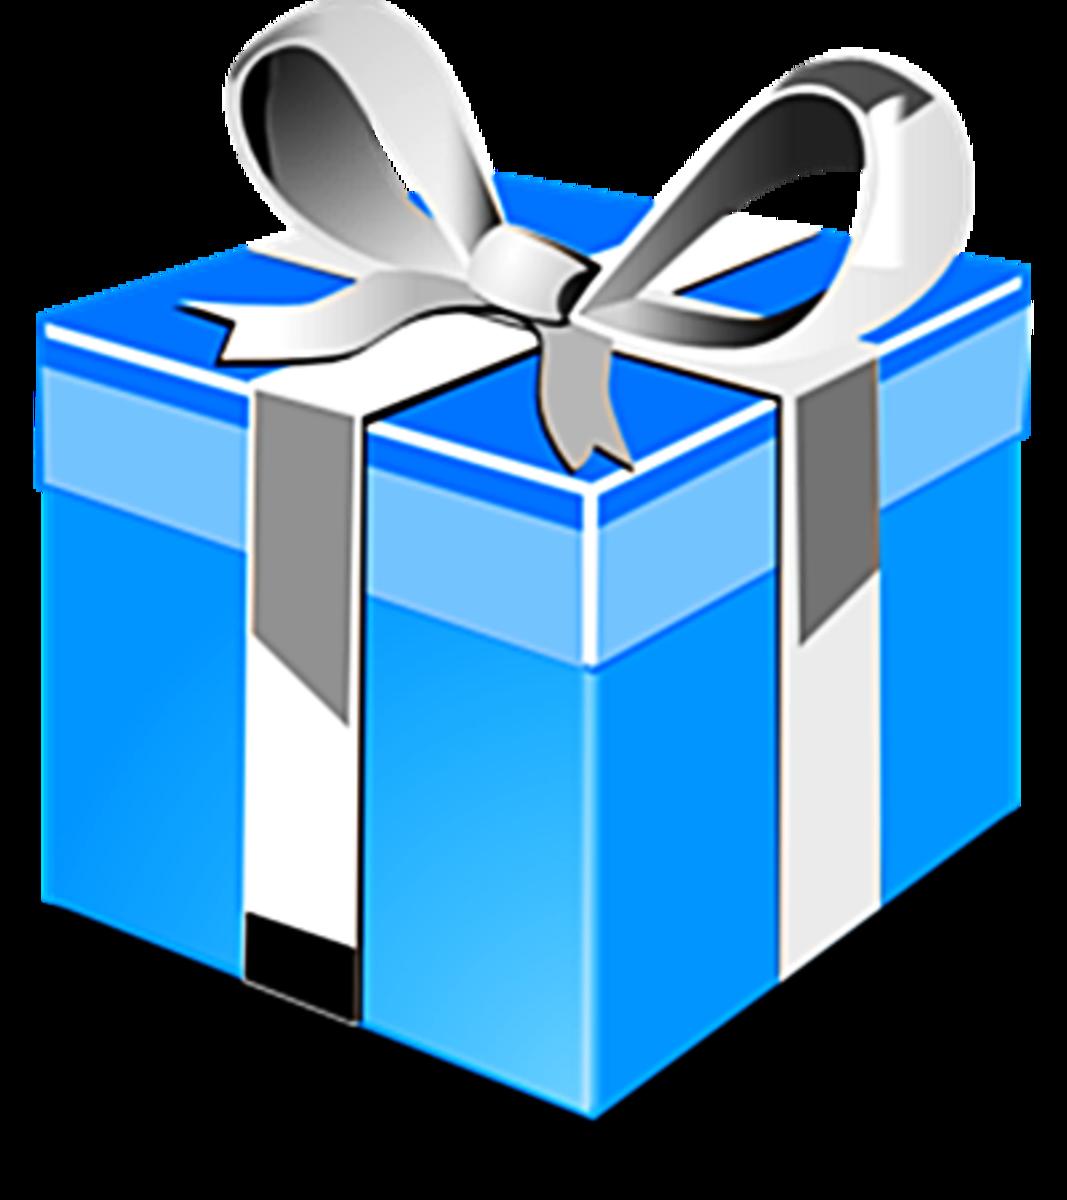 Best Gifts for Men - Garage Tools Gift Ideas under $100